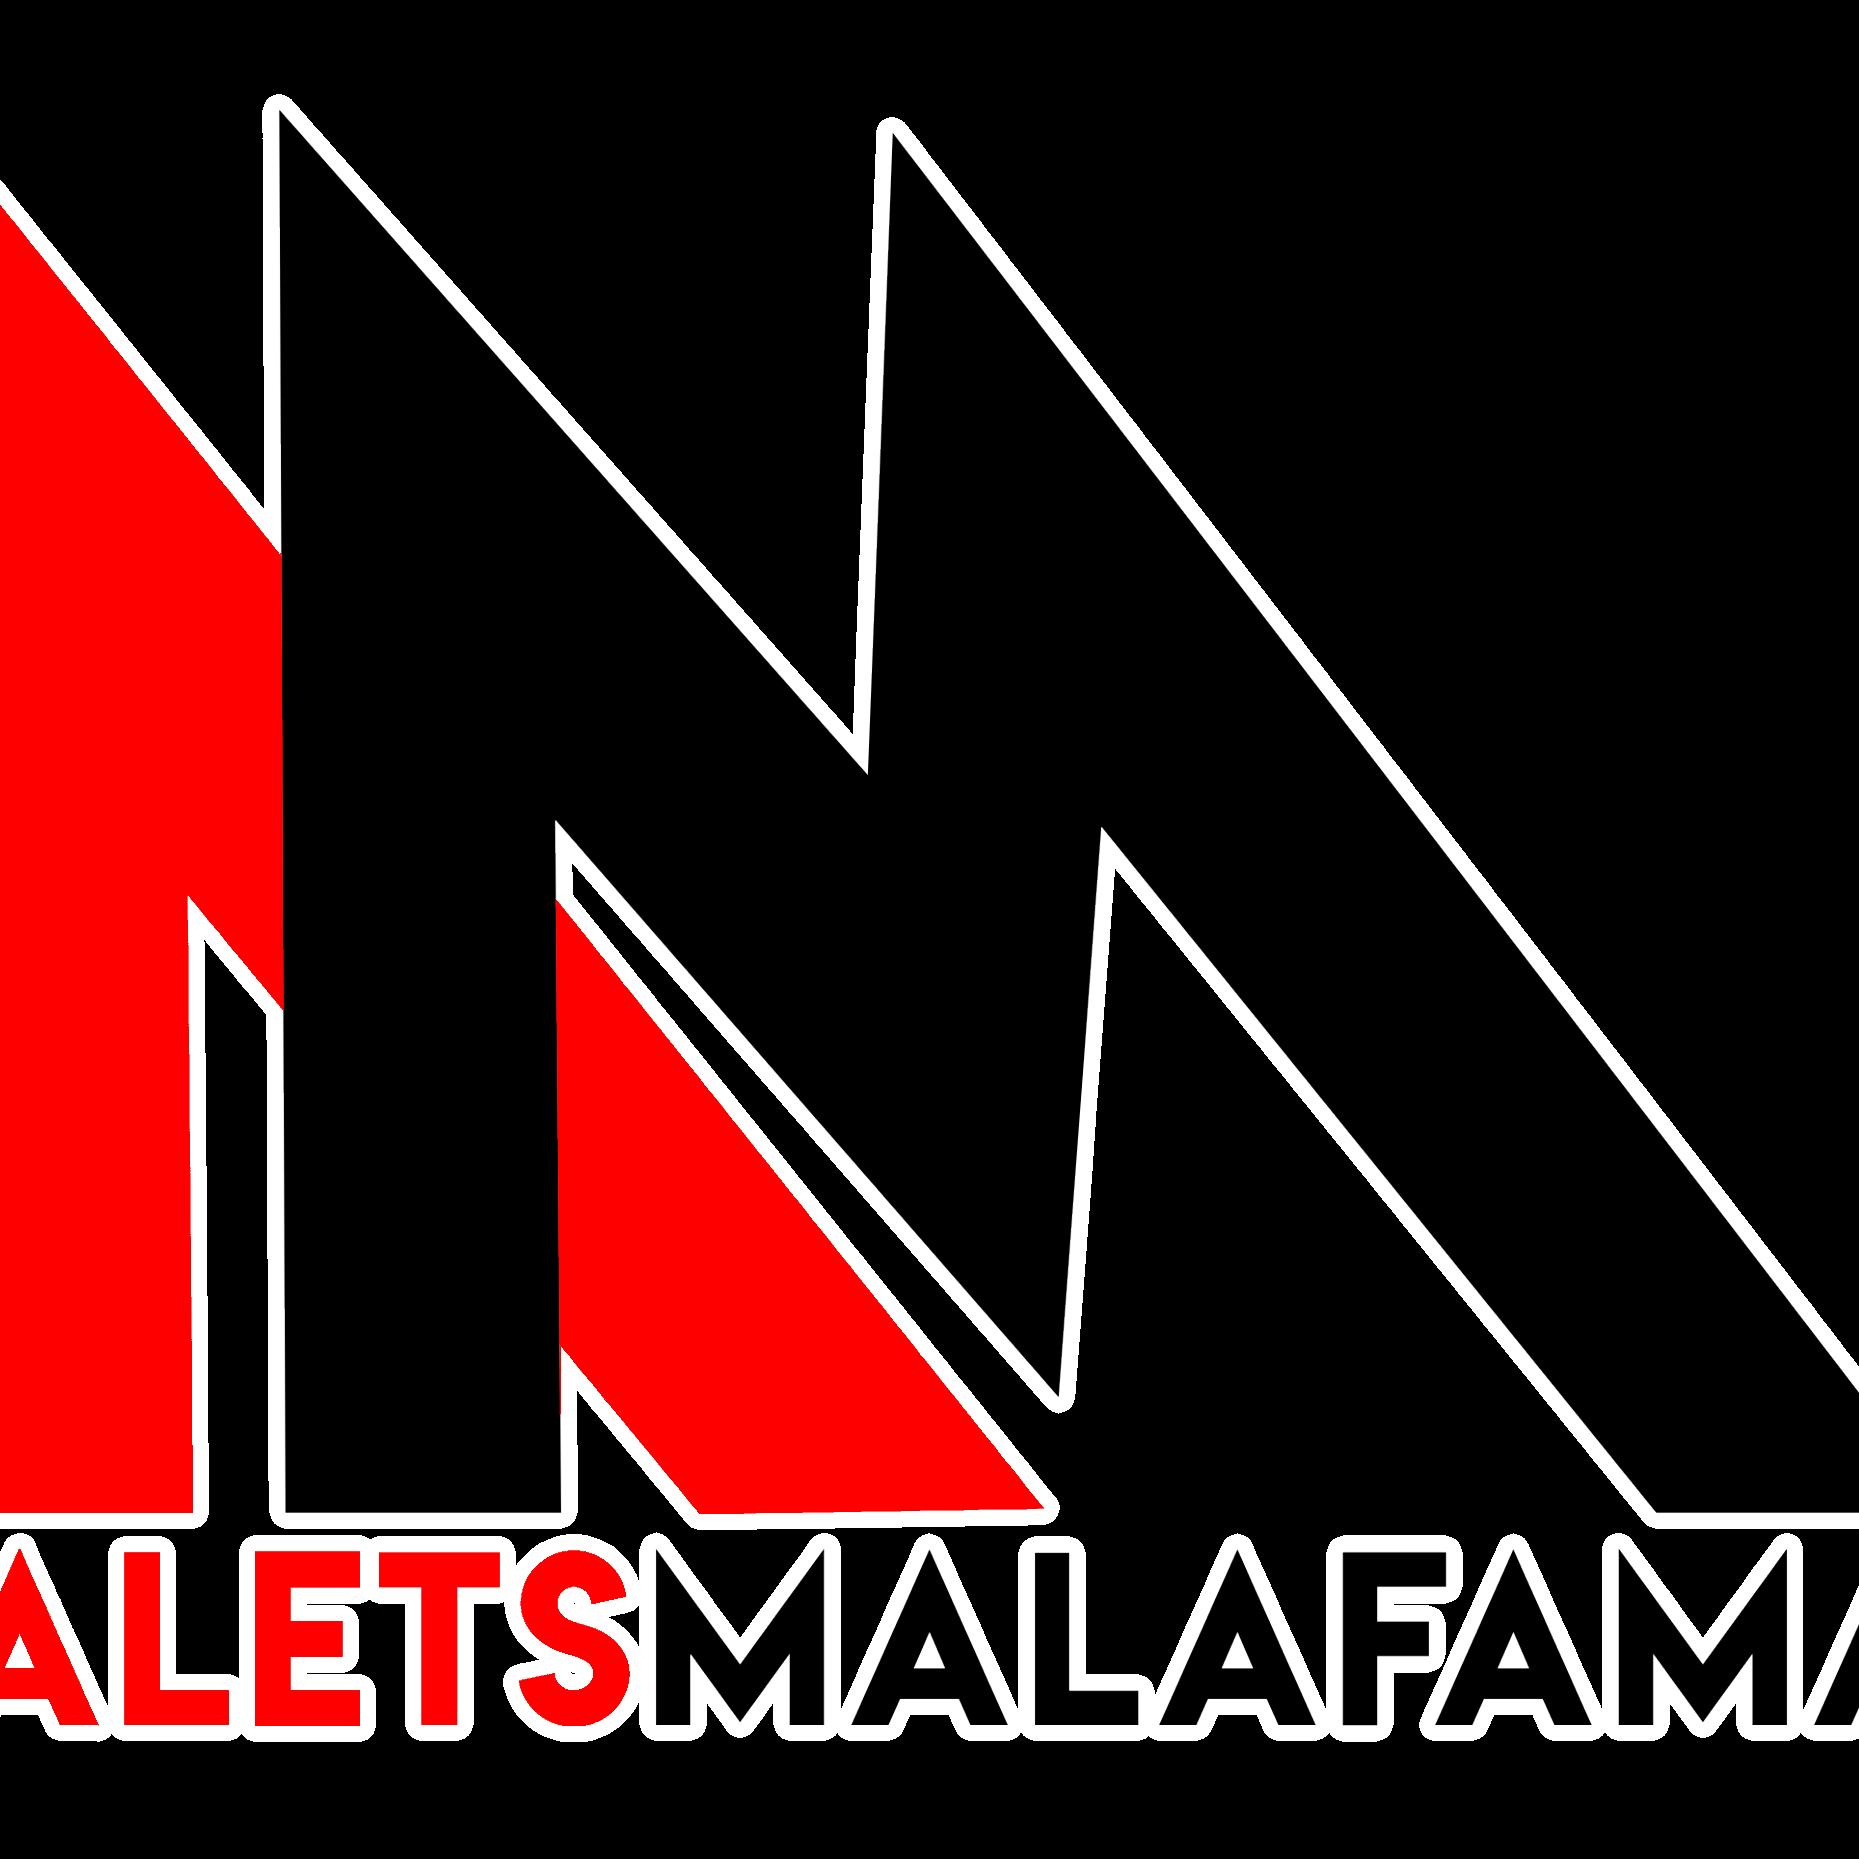 Radio Malafama